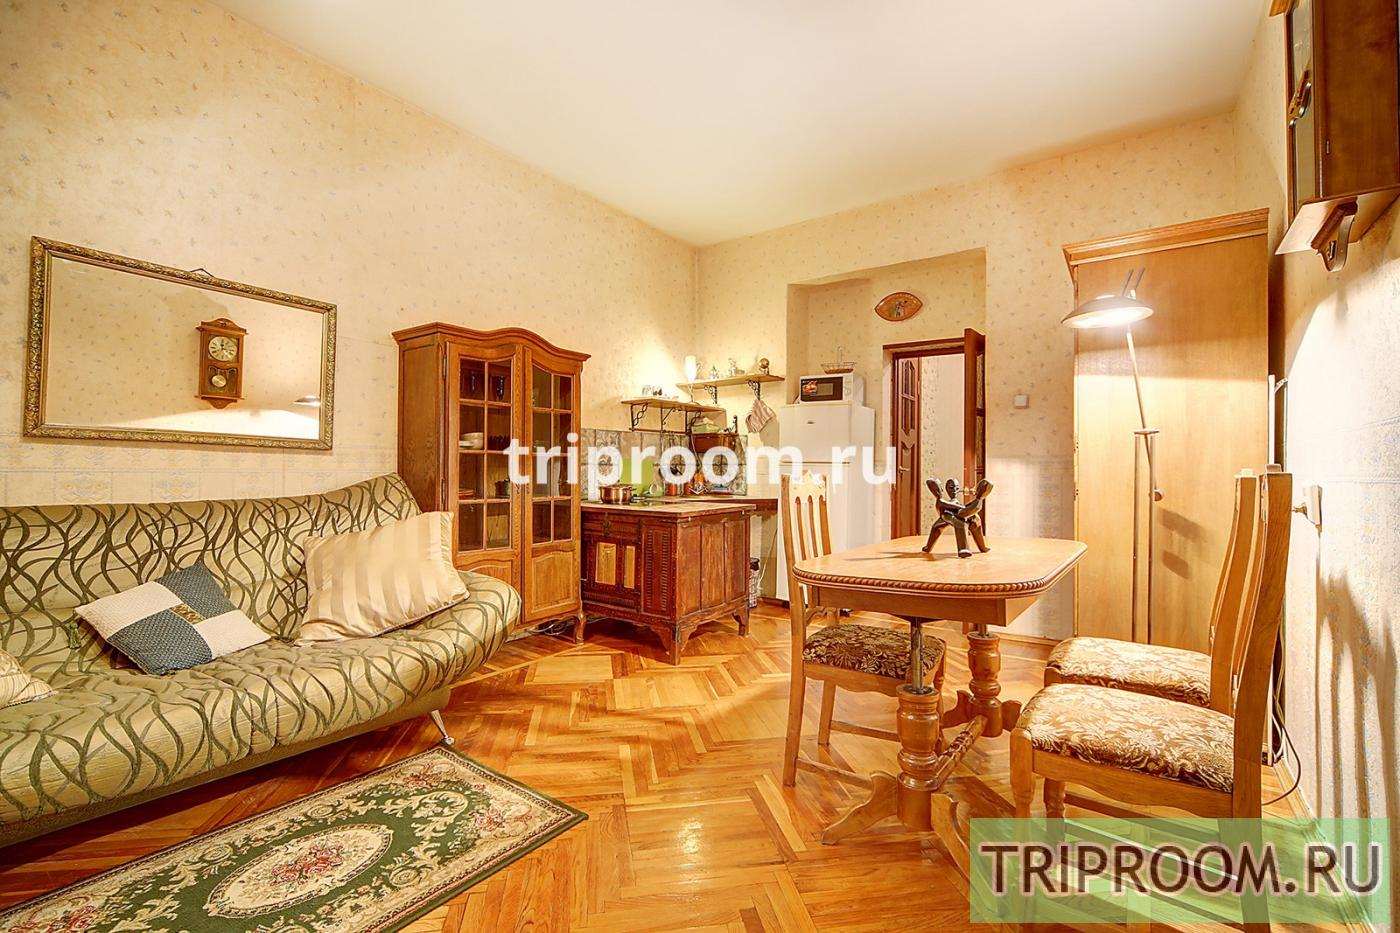 1-комнатная квартира посуточно (вариант № 15445), ул. Лиговский проспект, фото № 7